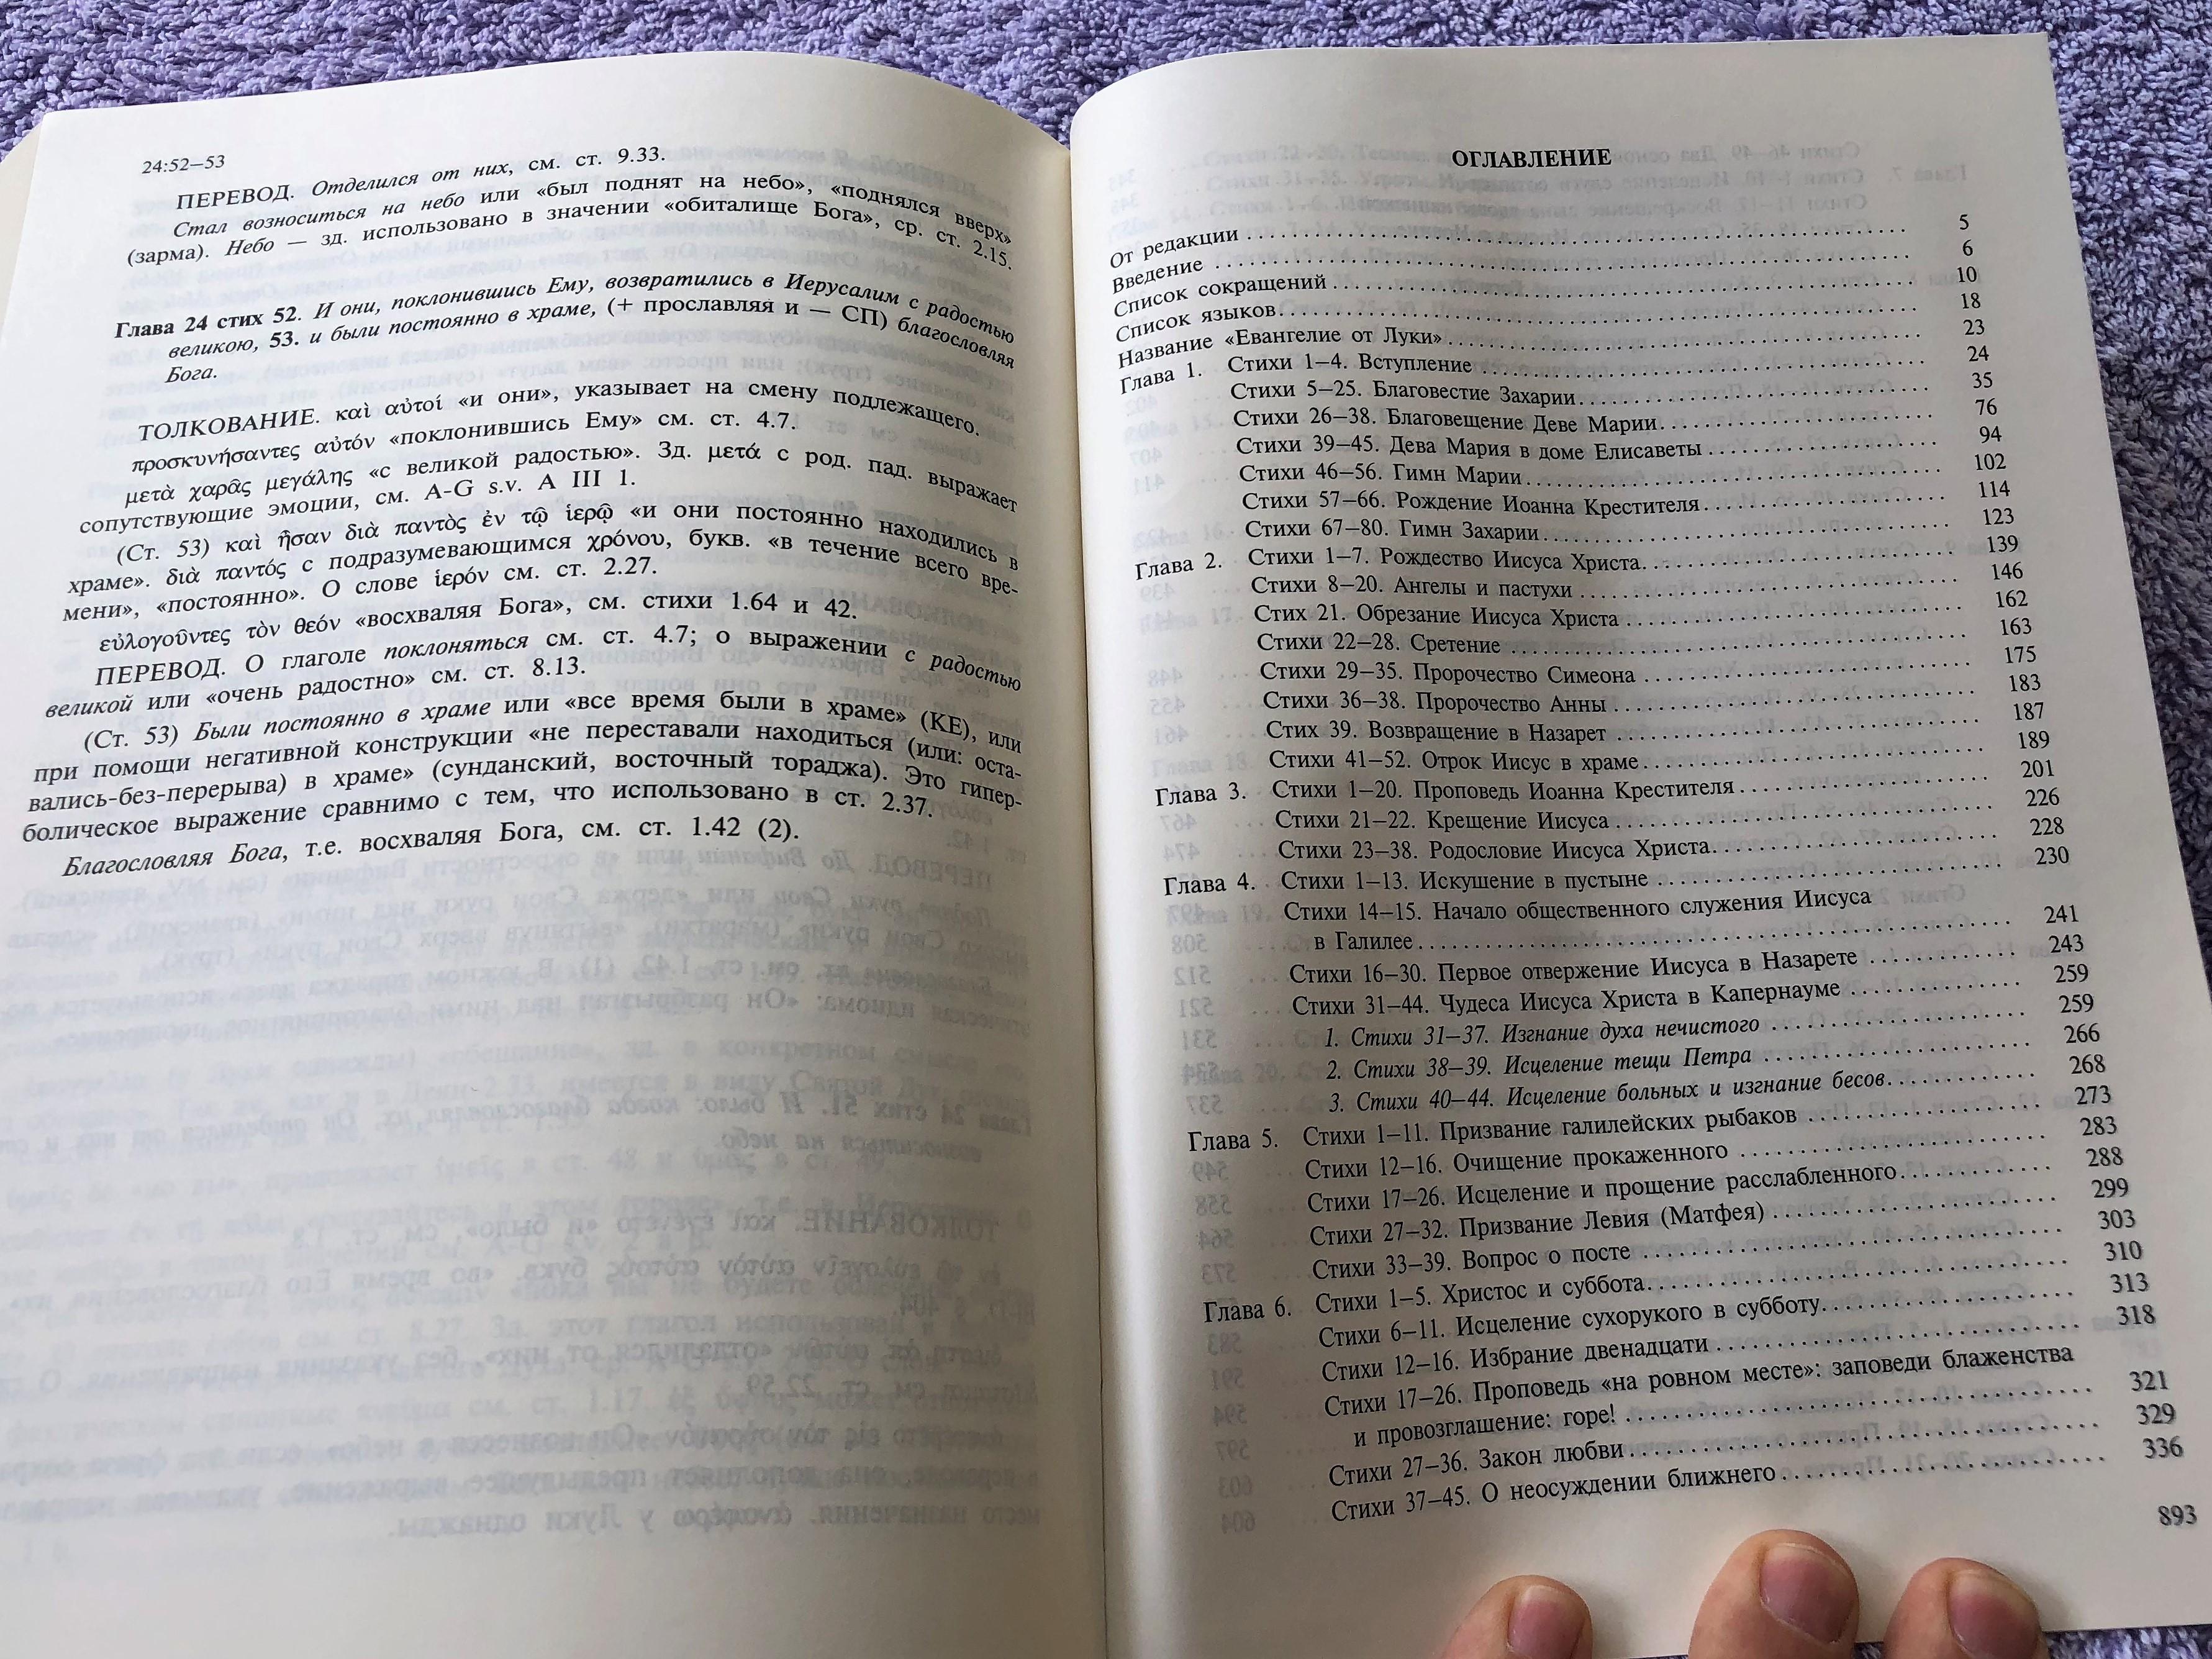 russian-language-edition-of-the-helps-for-bible-translators-a-translator-s-handbook-on-the-gospel-of-luke-16-.jpg